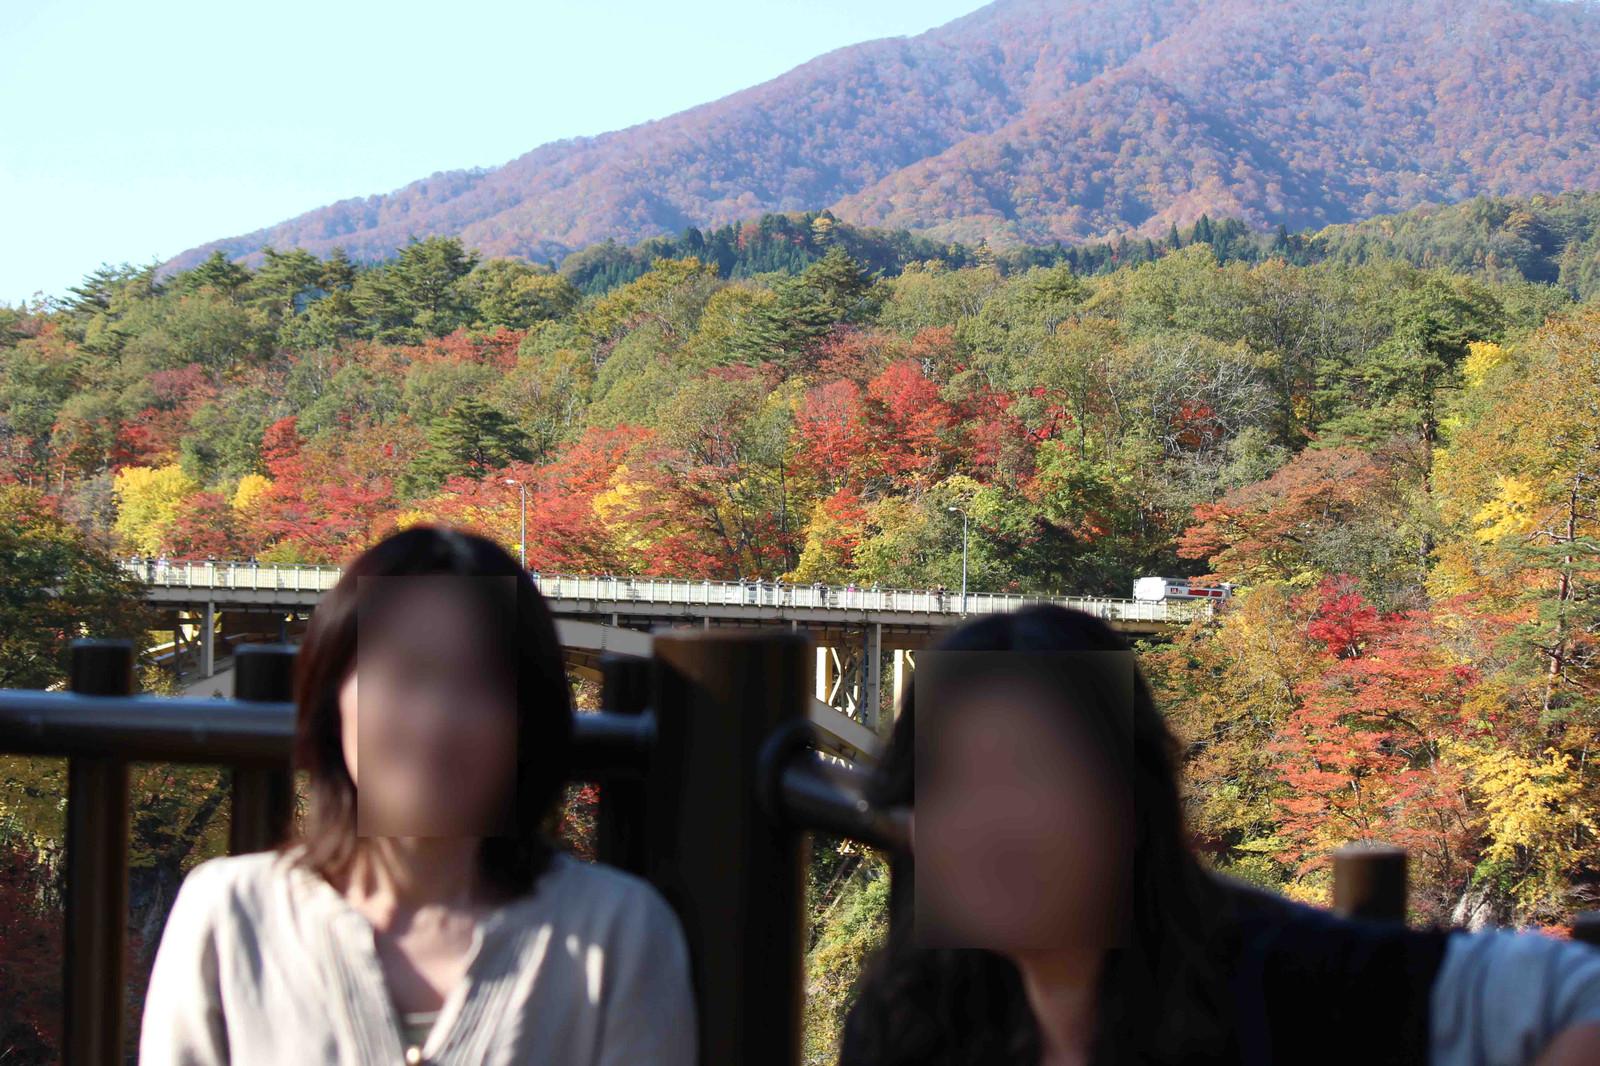 2014_10_24_7388_edited1